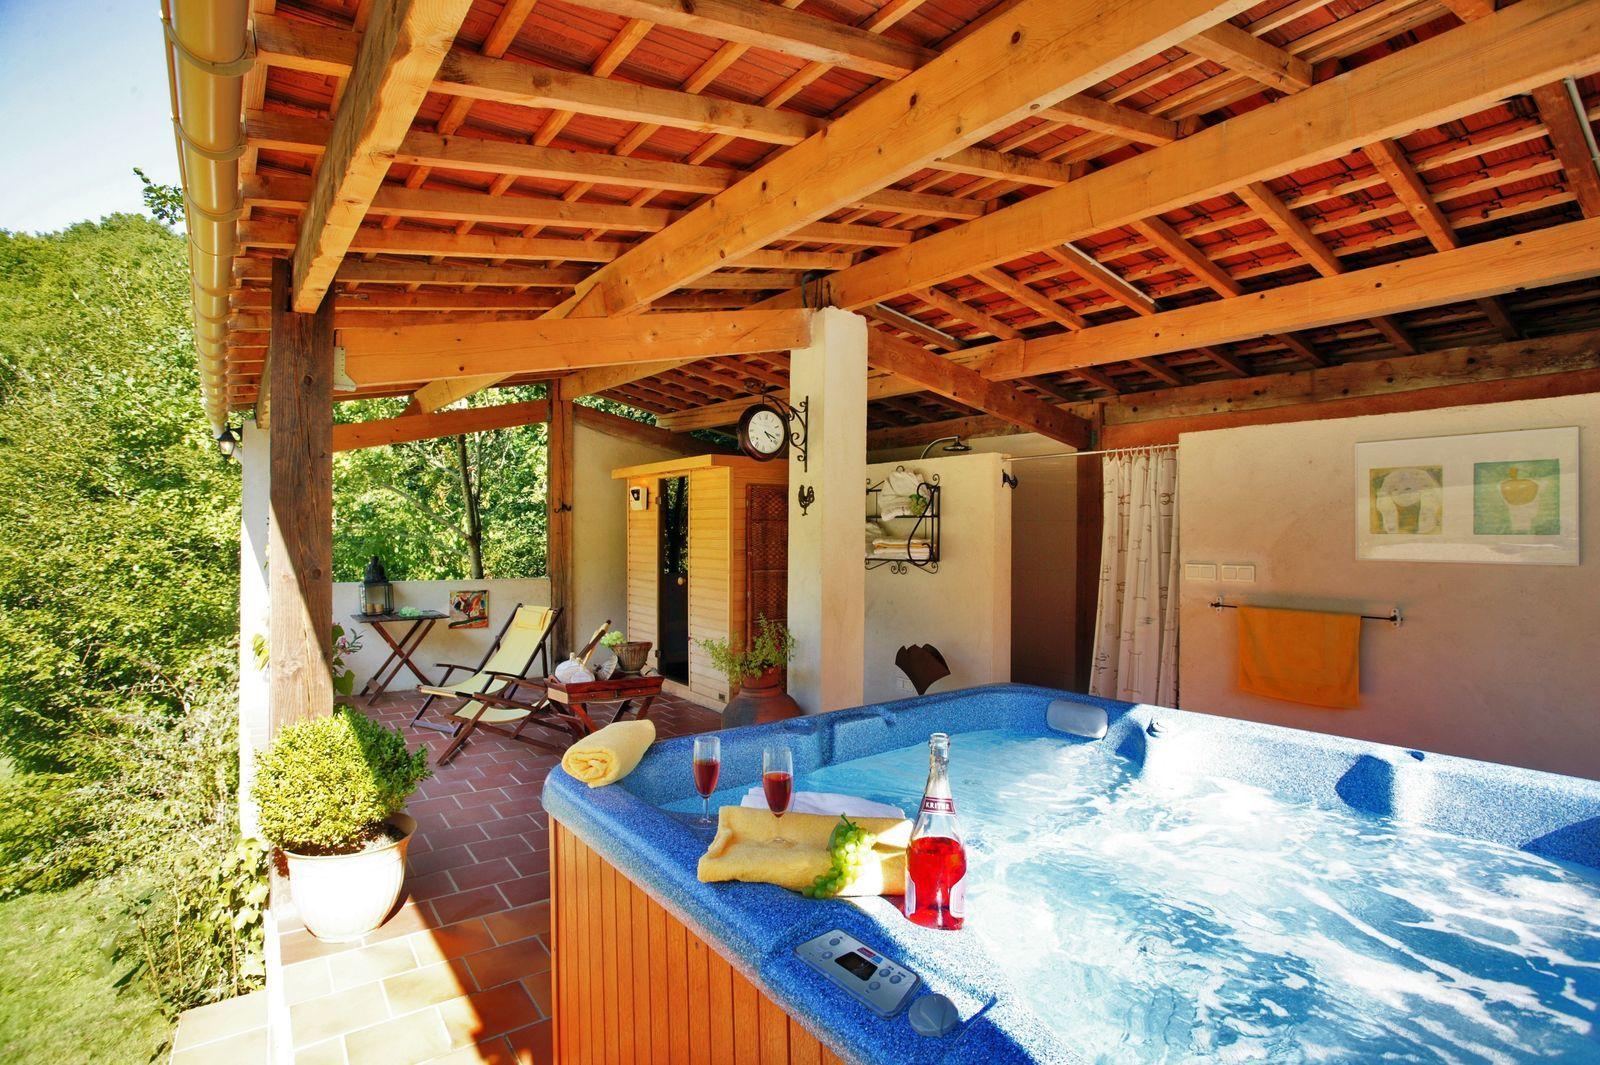 La Nouvelle Source - Henry vakantiehuis Dordogne, Frankrijk